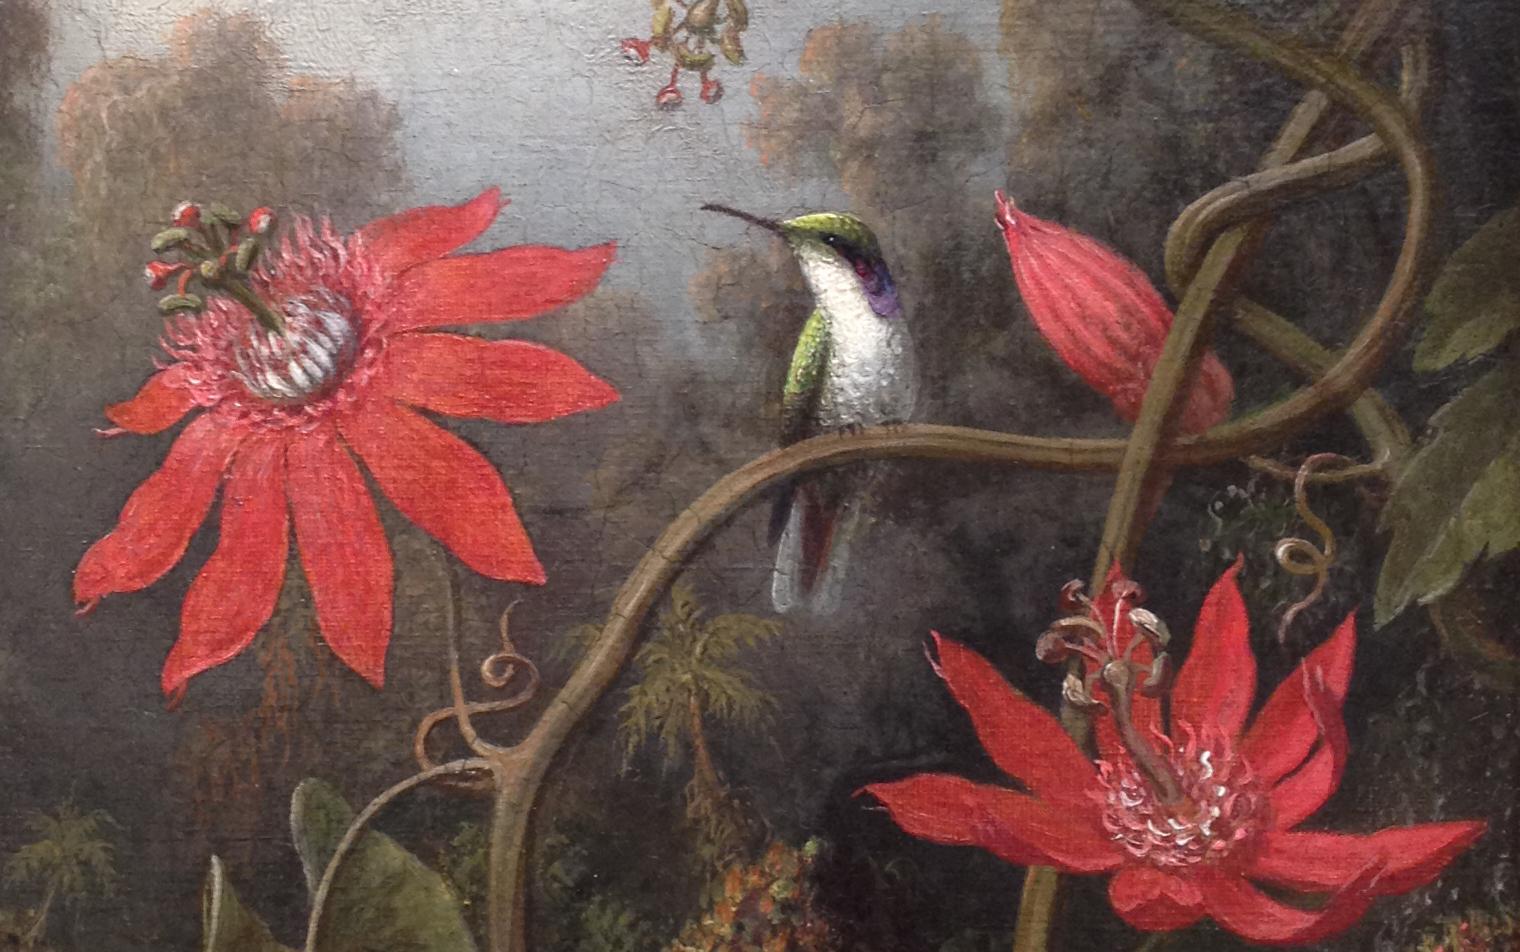 Martin-Johnson-Heade-Hummingbirds-and-Passionflowers-close-up-jessewaugh.com.jpg